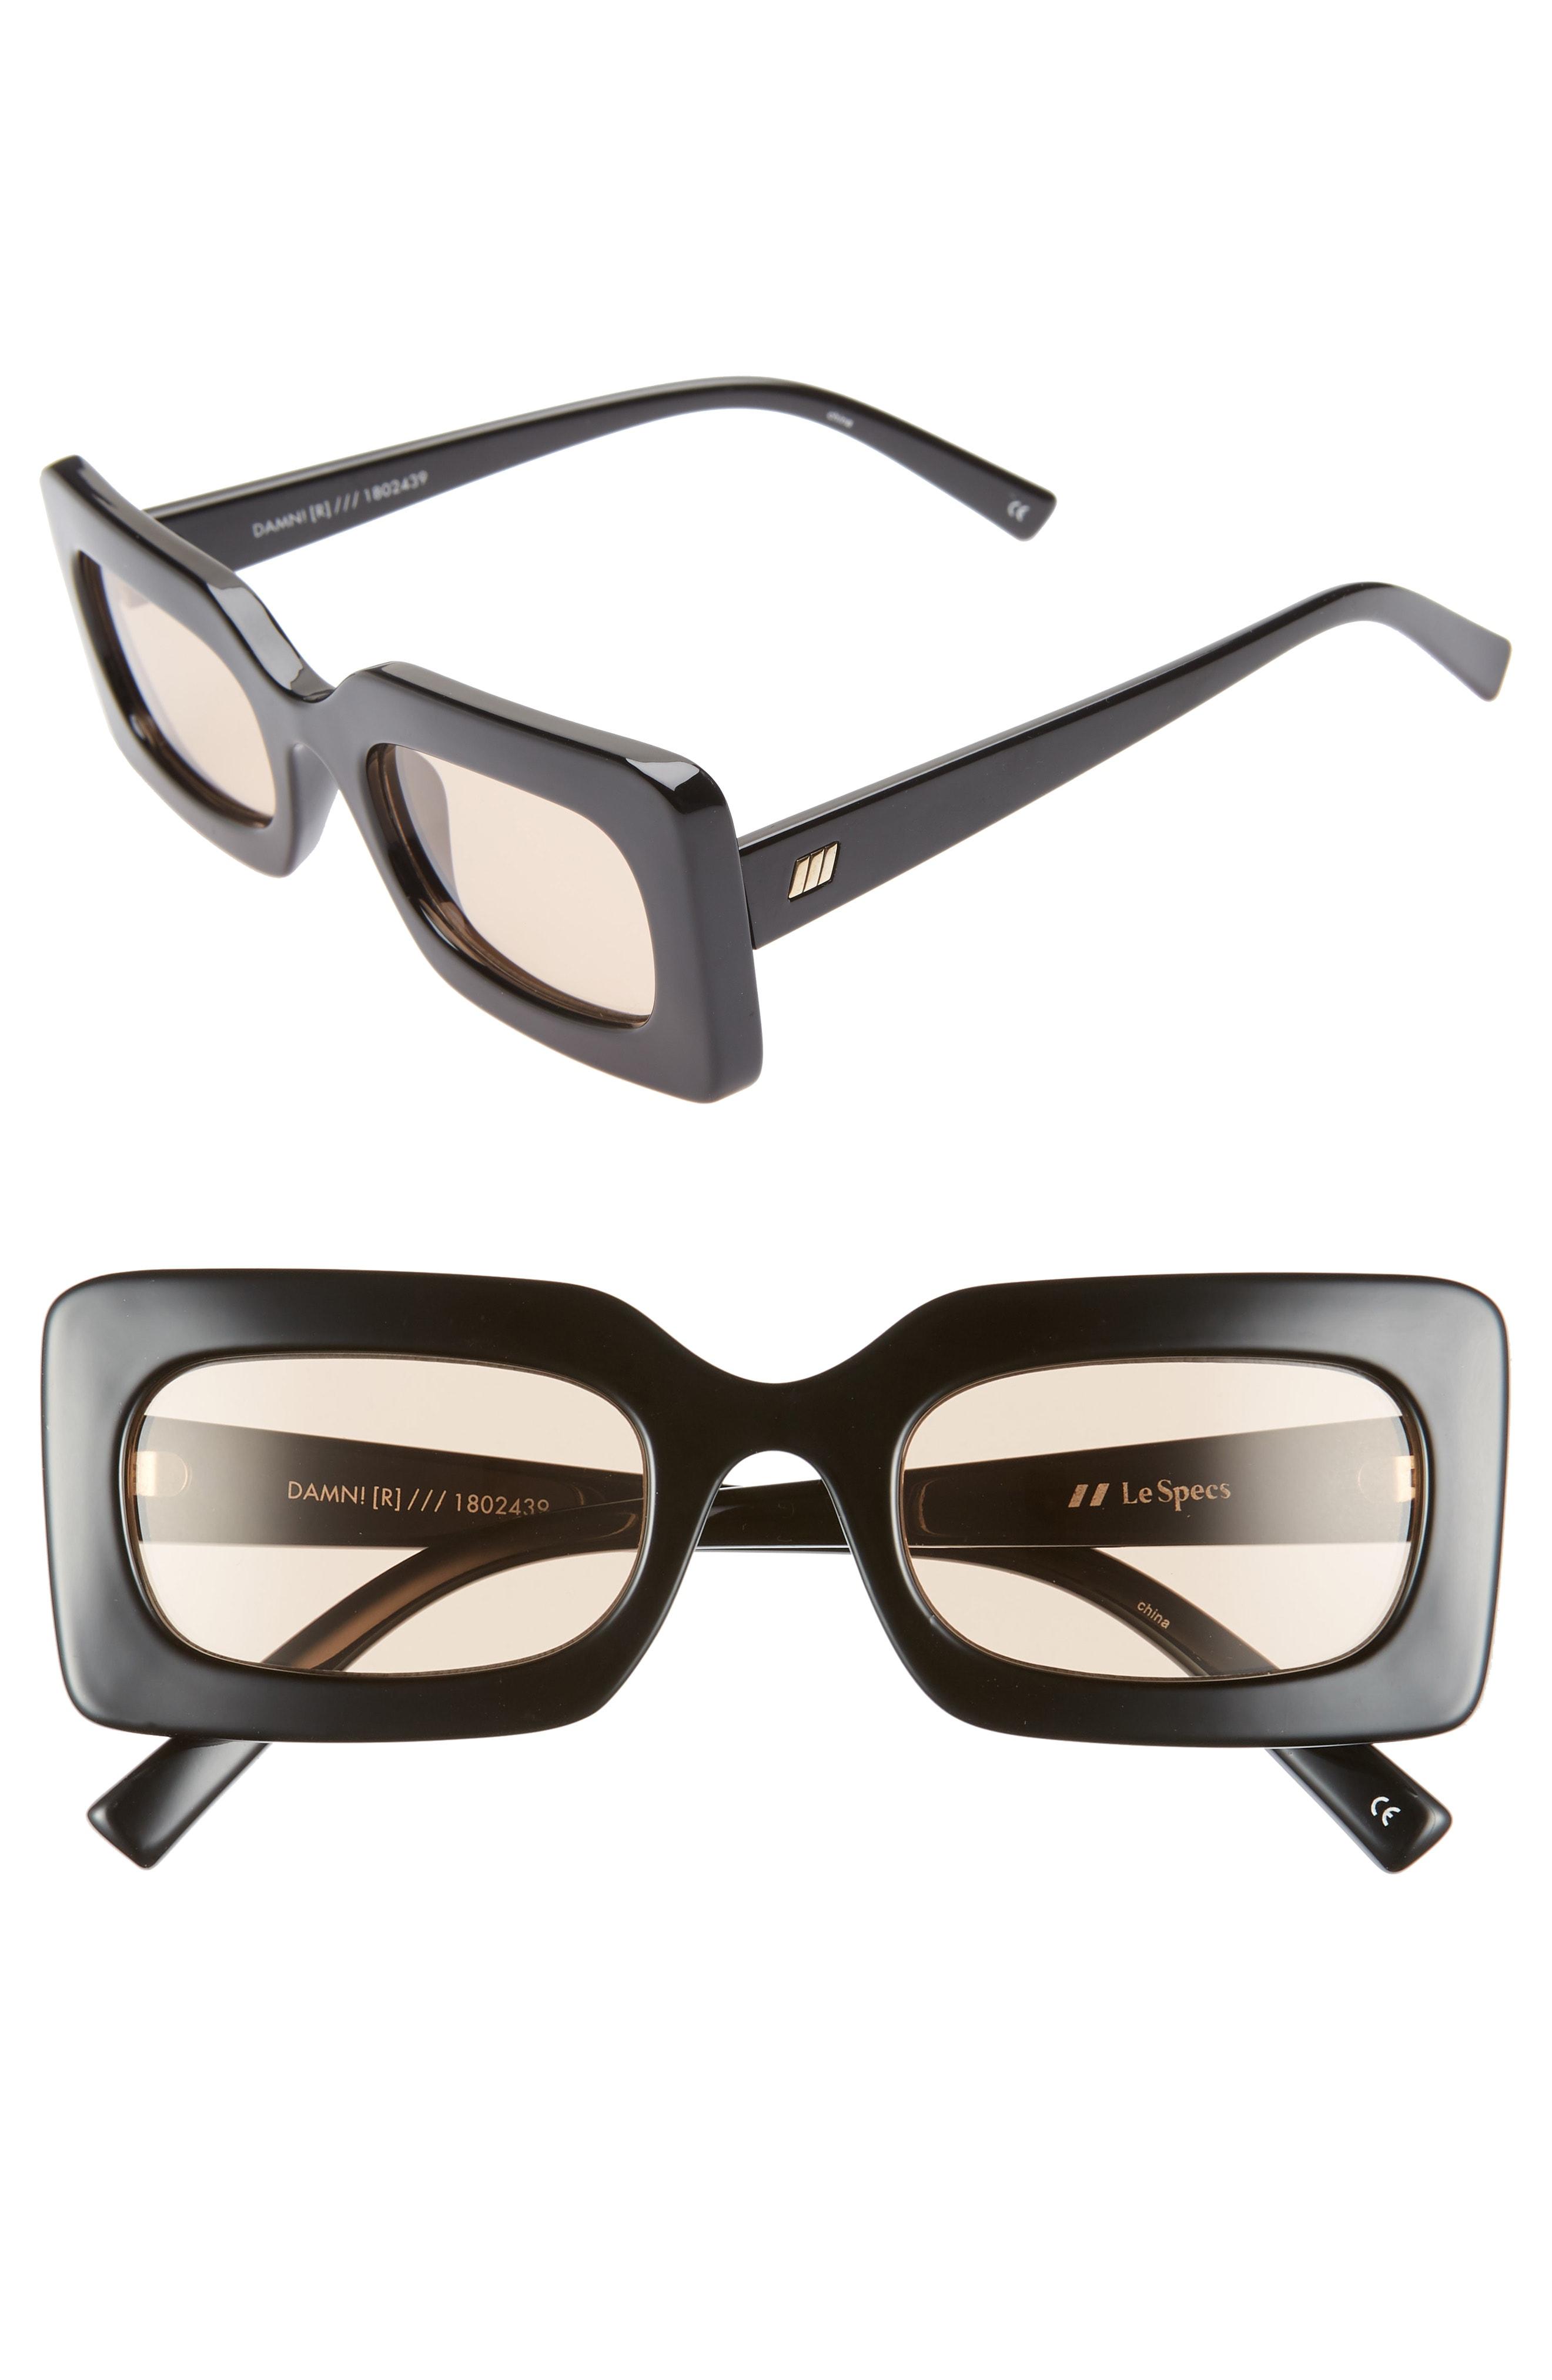 Le Specs 50mm Rectangle Sunglasses